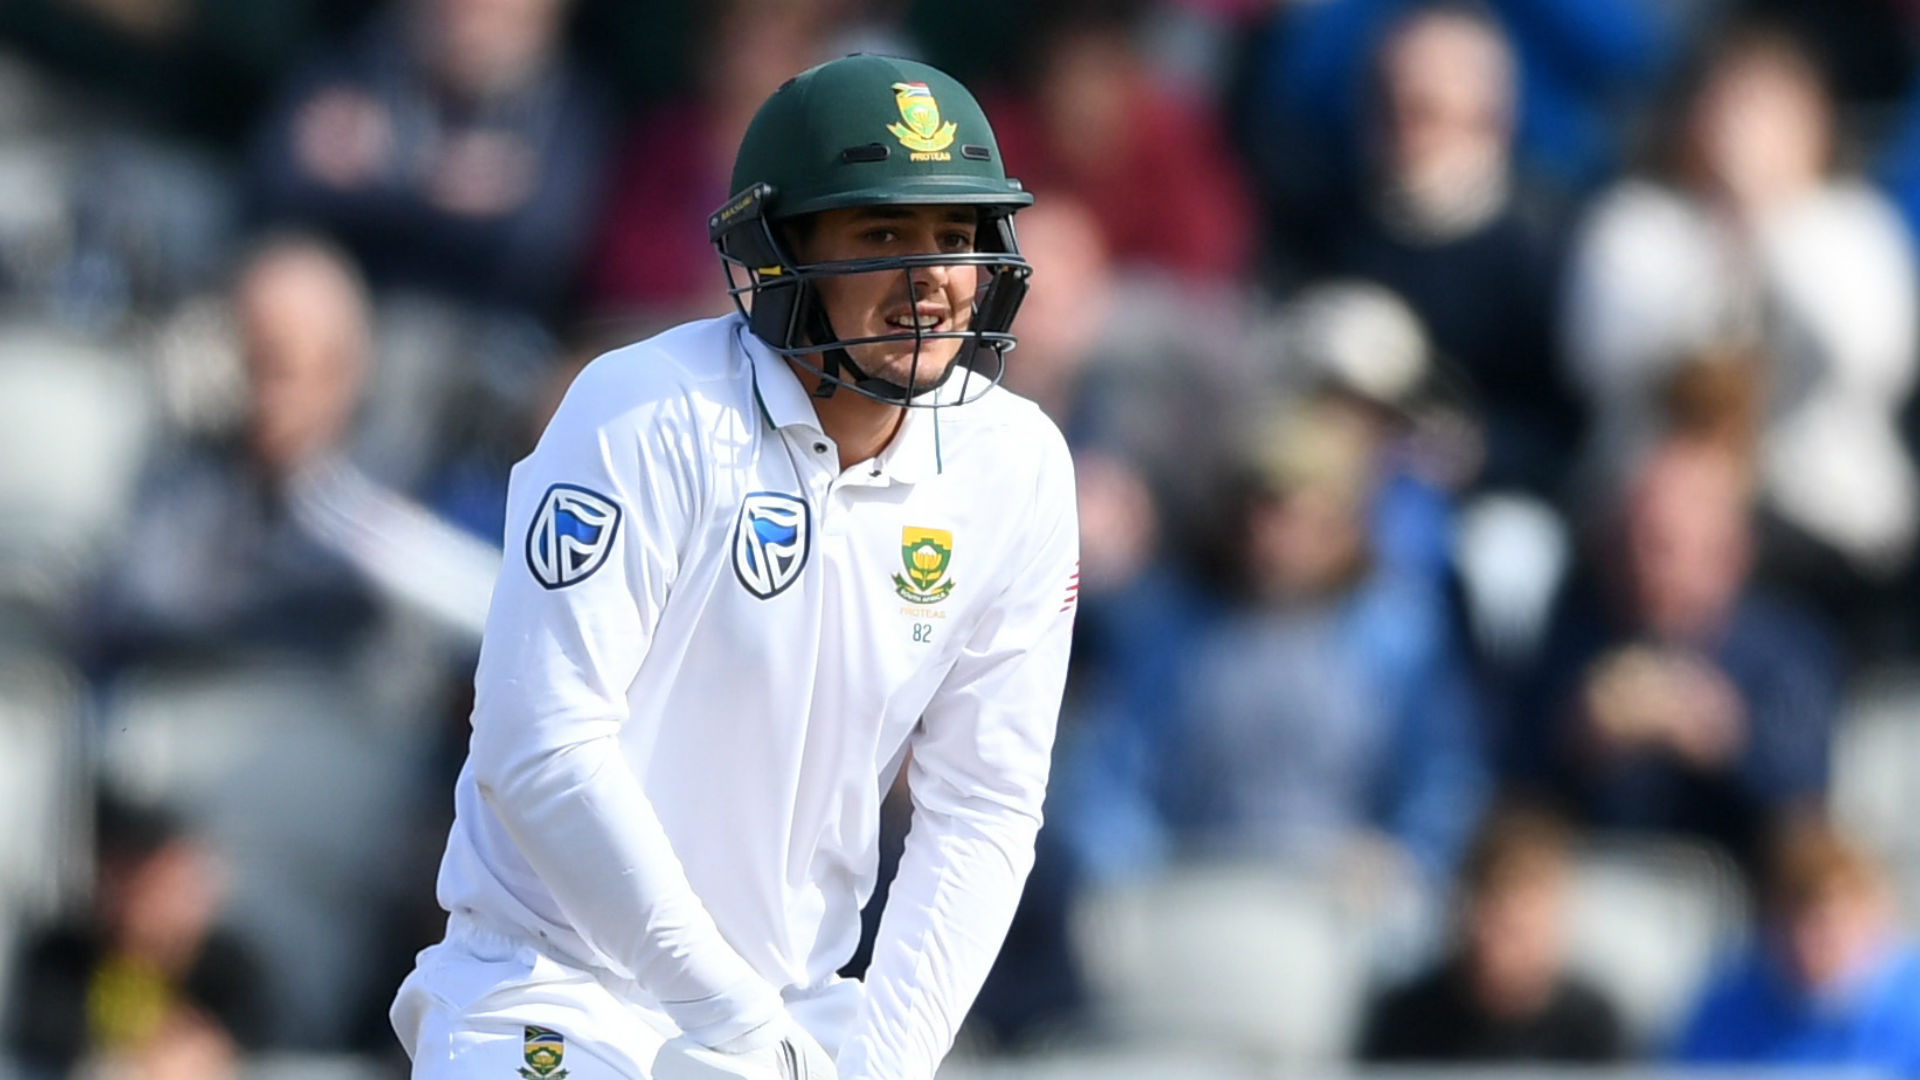 South Africa gain control through AB de Villiers's 74